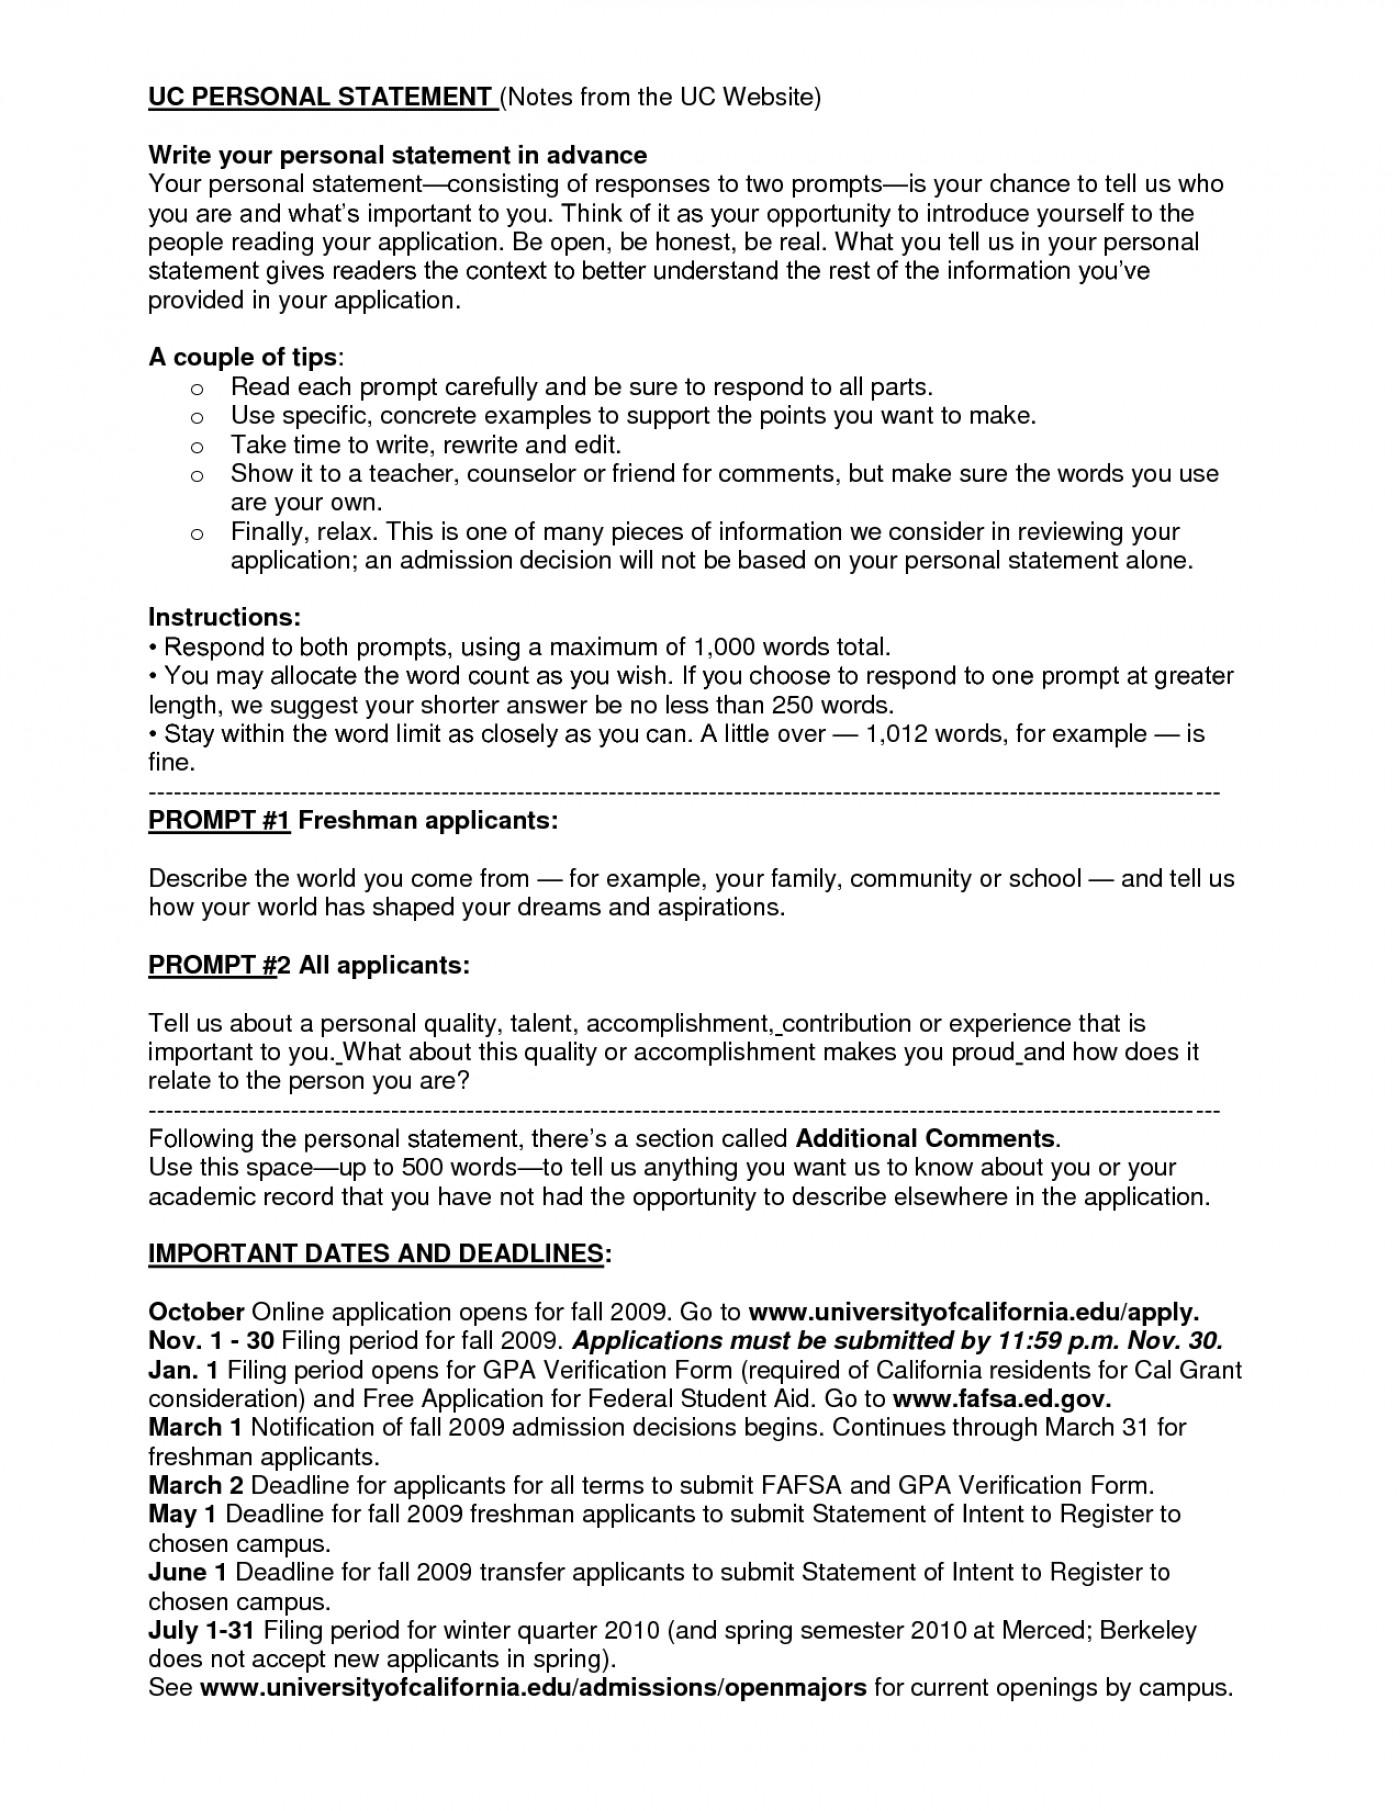 Gcse coursework assignment macbeth